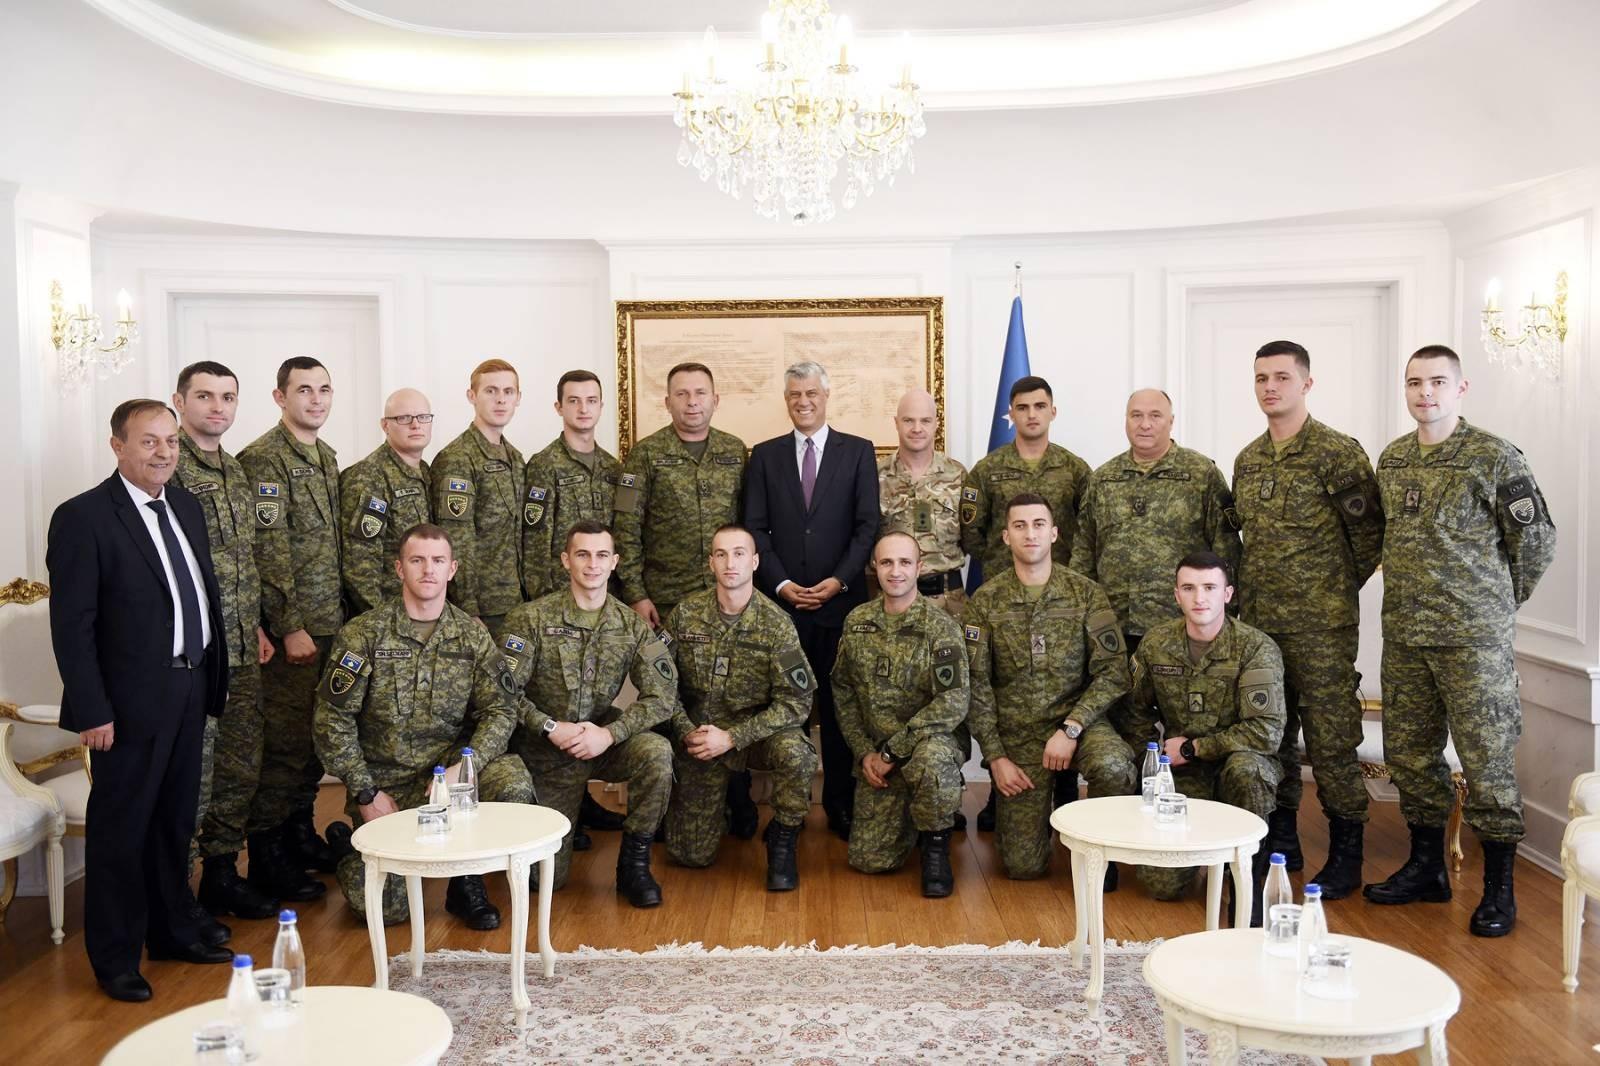 Thaçi: Οι δυνάμεις ασφαλείας του Κοσσυφοπεδίου είναι ένας σύγχρονος στρατός